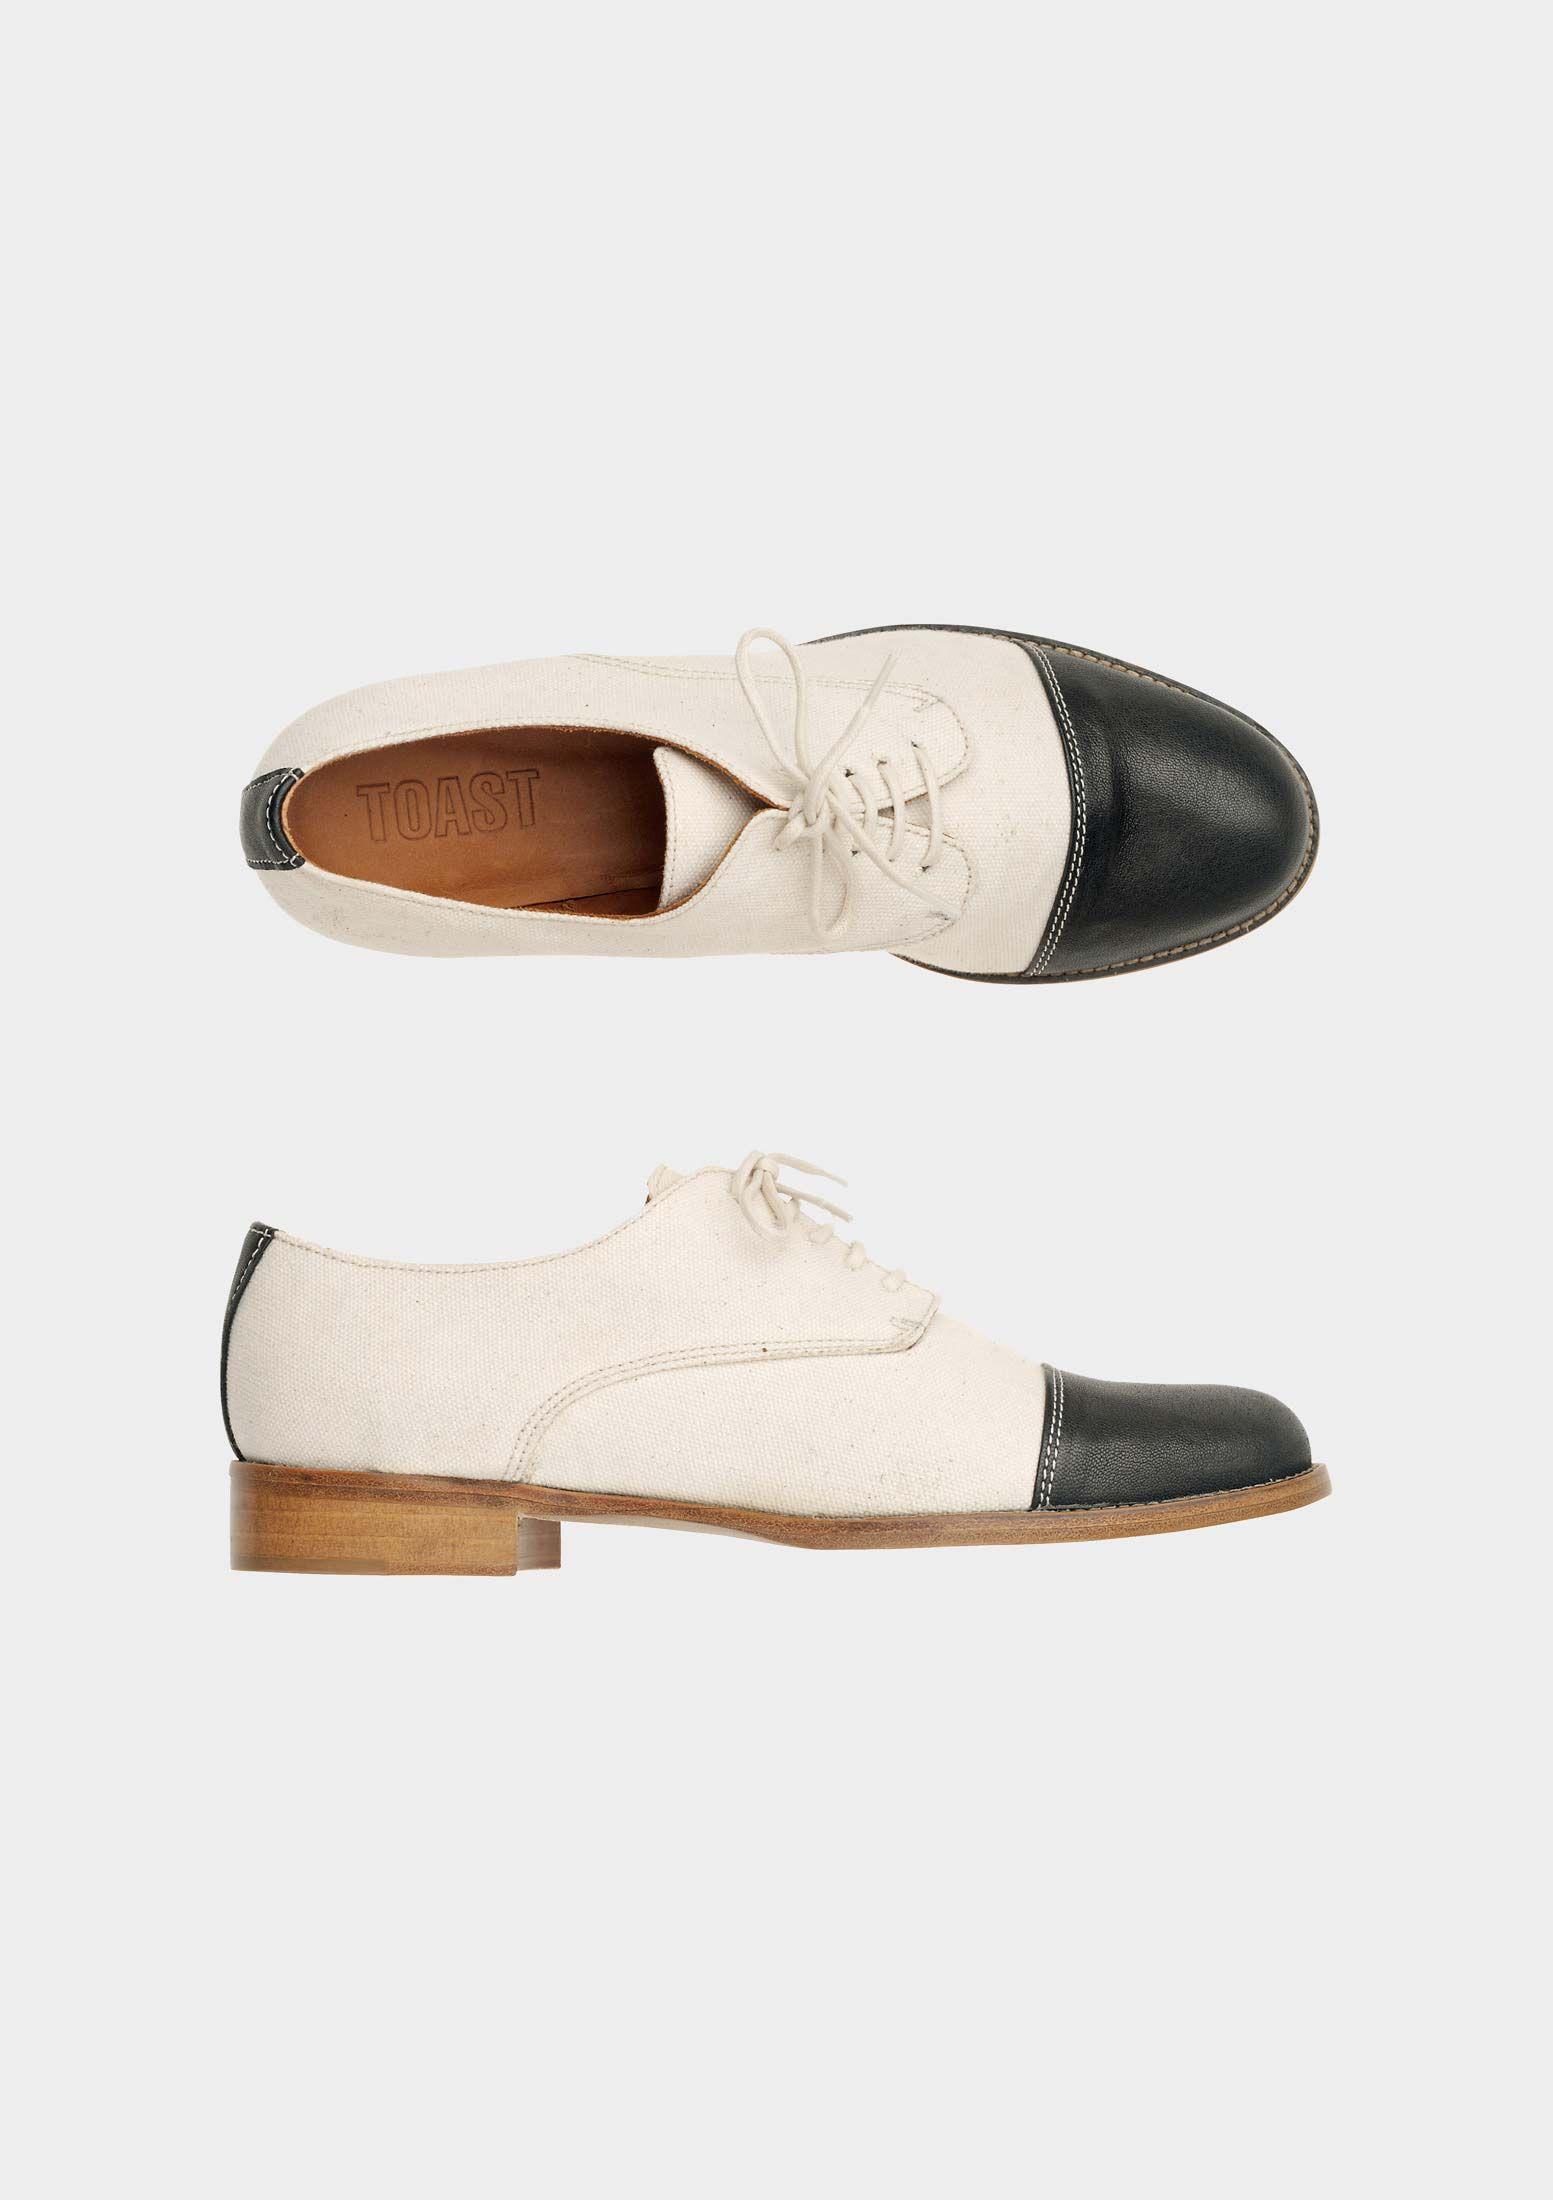 9229f8a3e67d2 CANVAS DERBY | TOAST | boy-wonder | Shoes, Footwear, Shoe boots